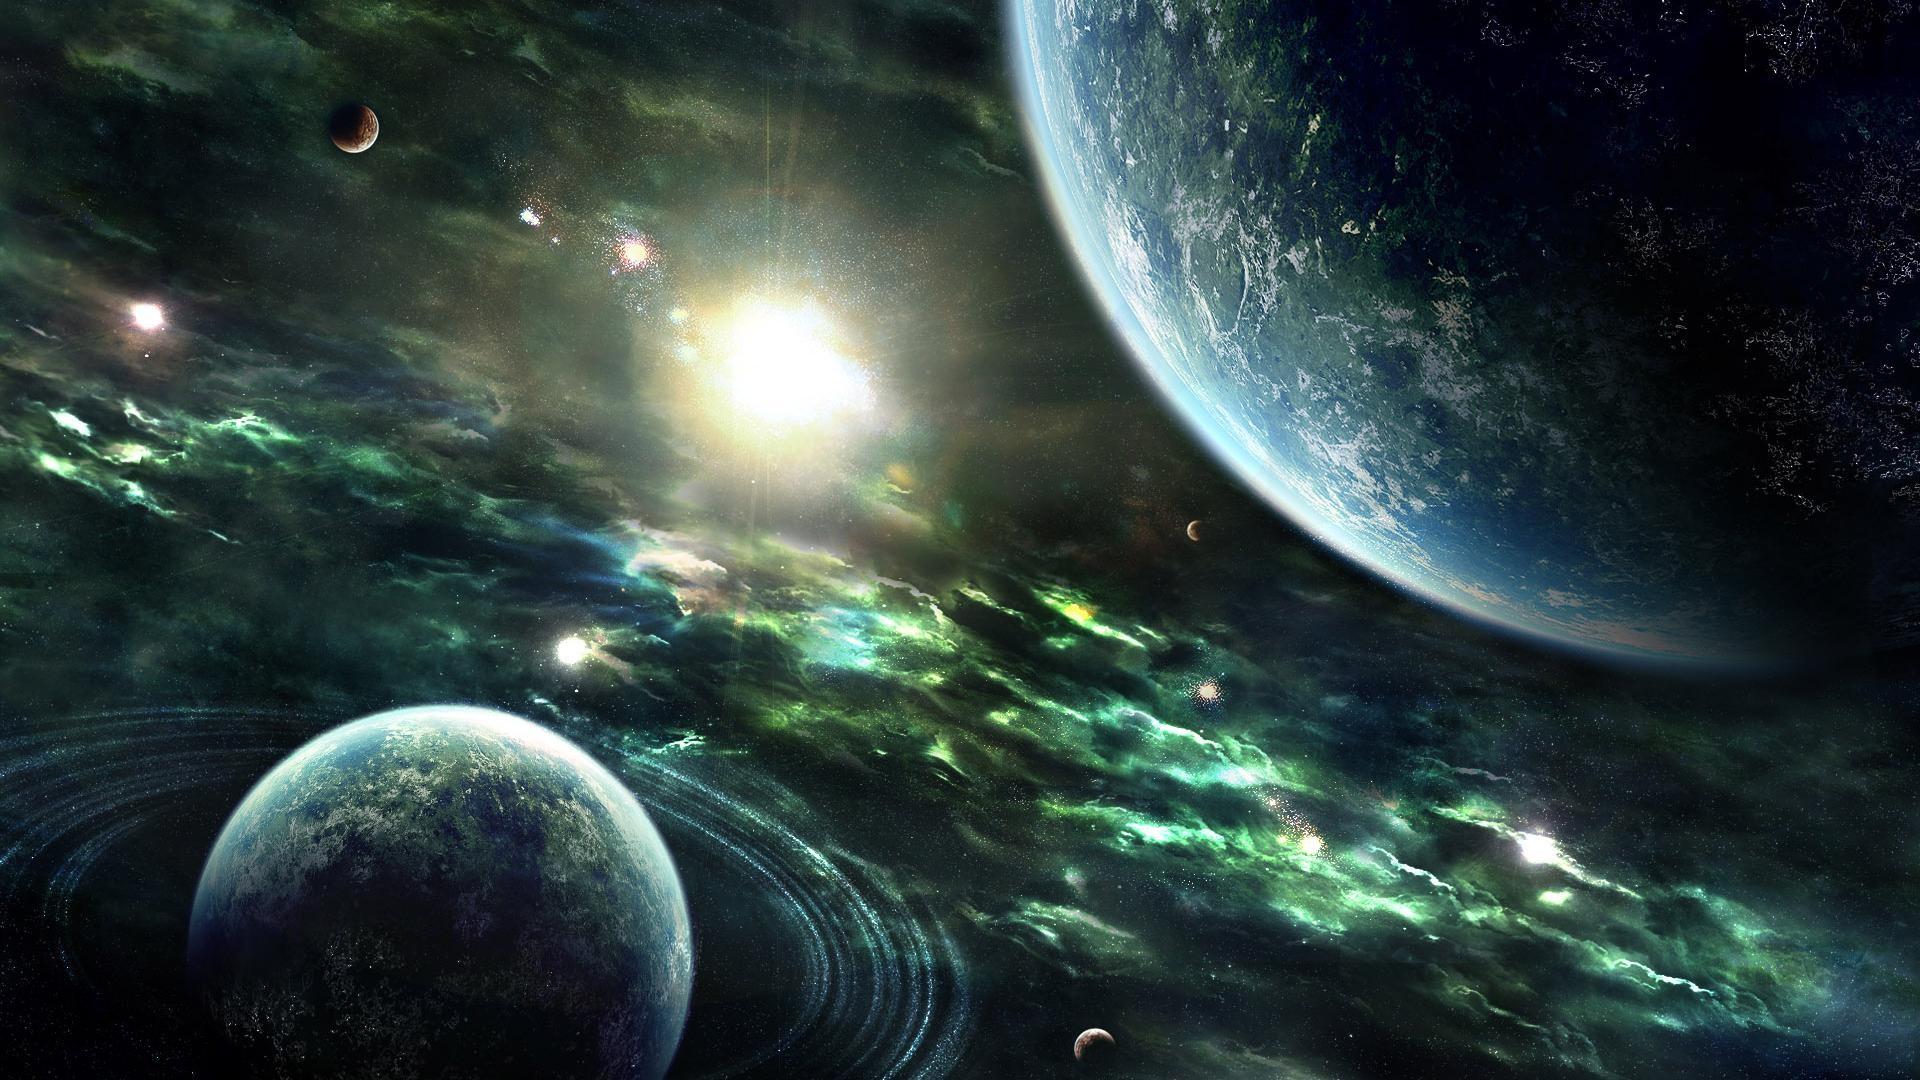 Space Wallpaper HD Widescreen